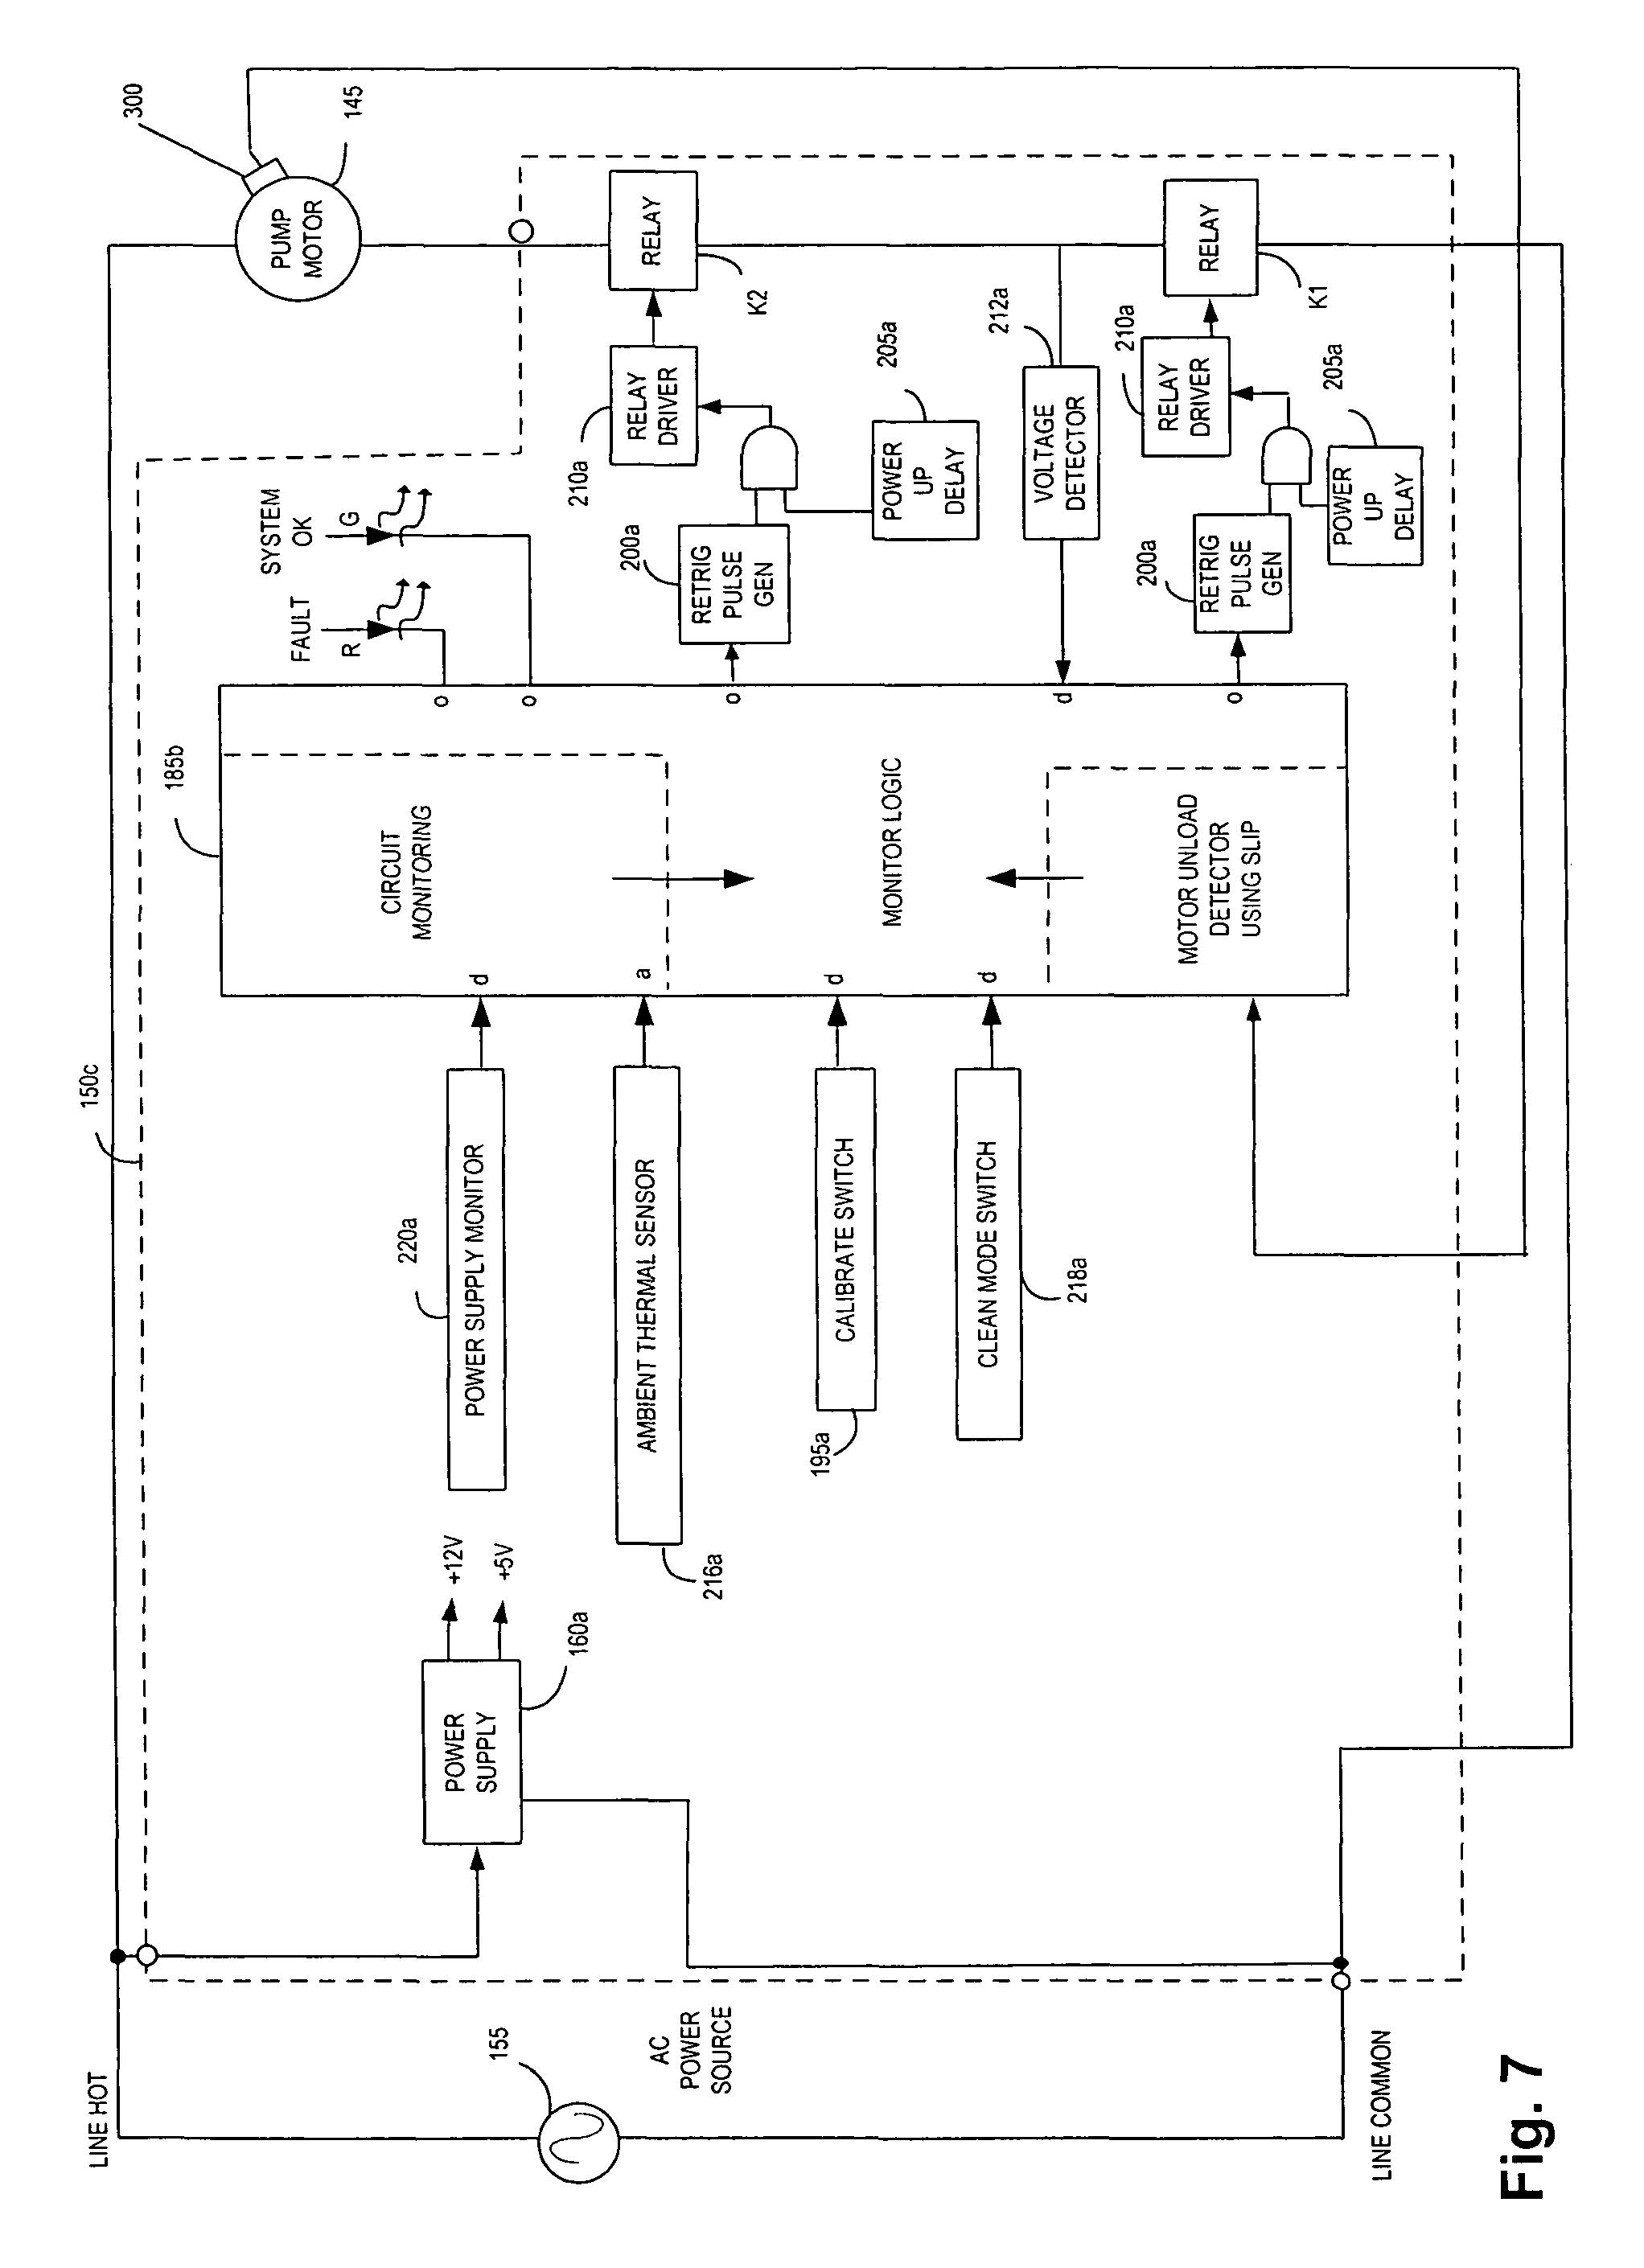 Ingersoll Rand T30 Wiring Diagram